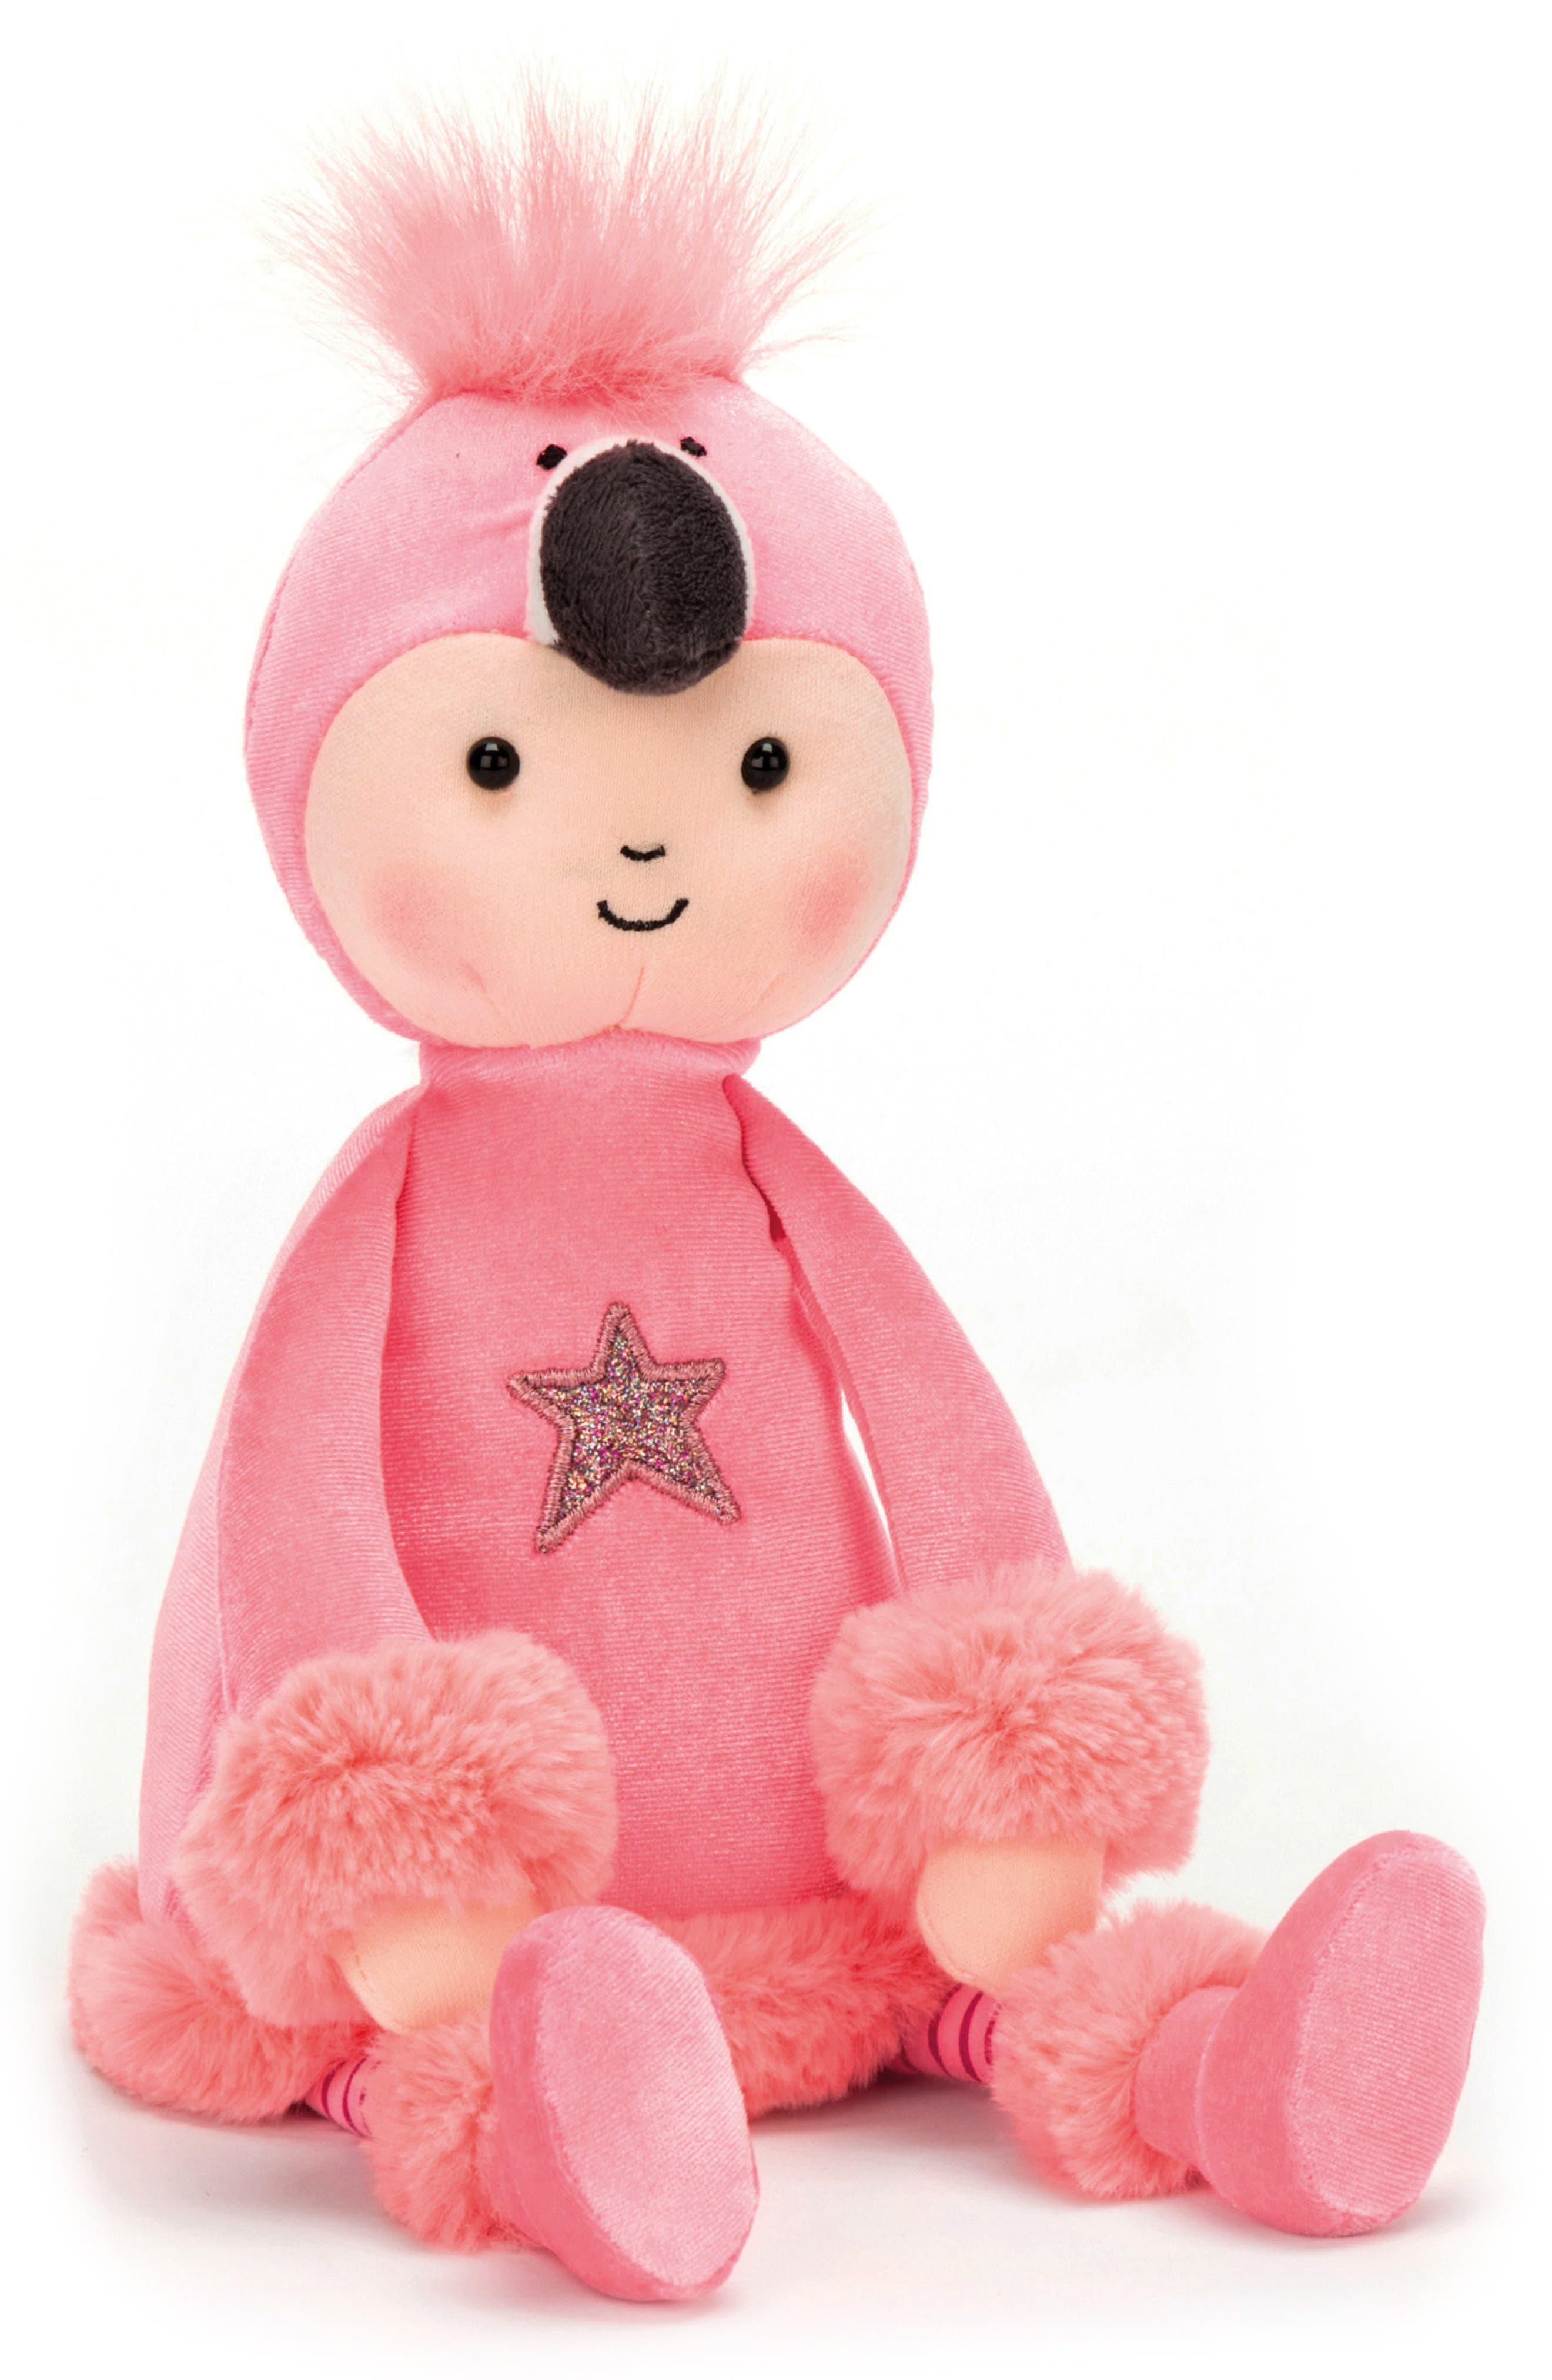 Perkies Flamingo Flapper Stuffed Doll,                             Main thumbnail 1, color,                             Pink